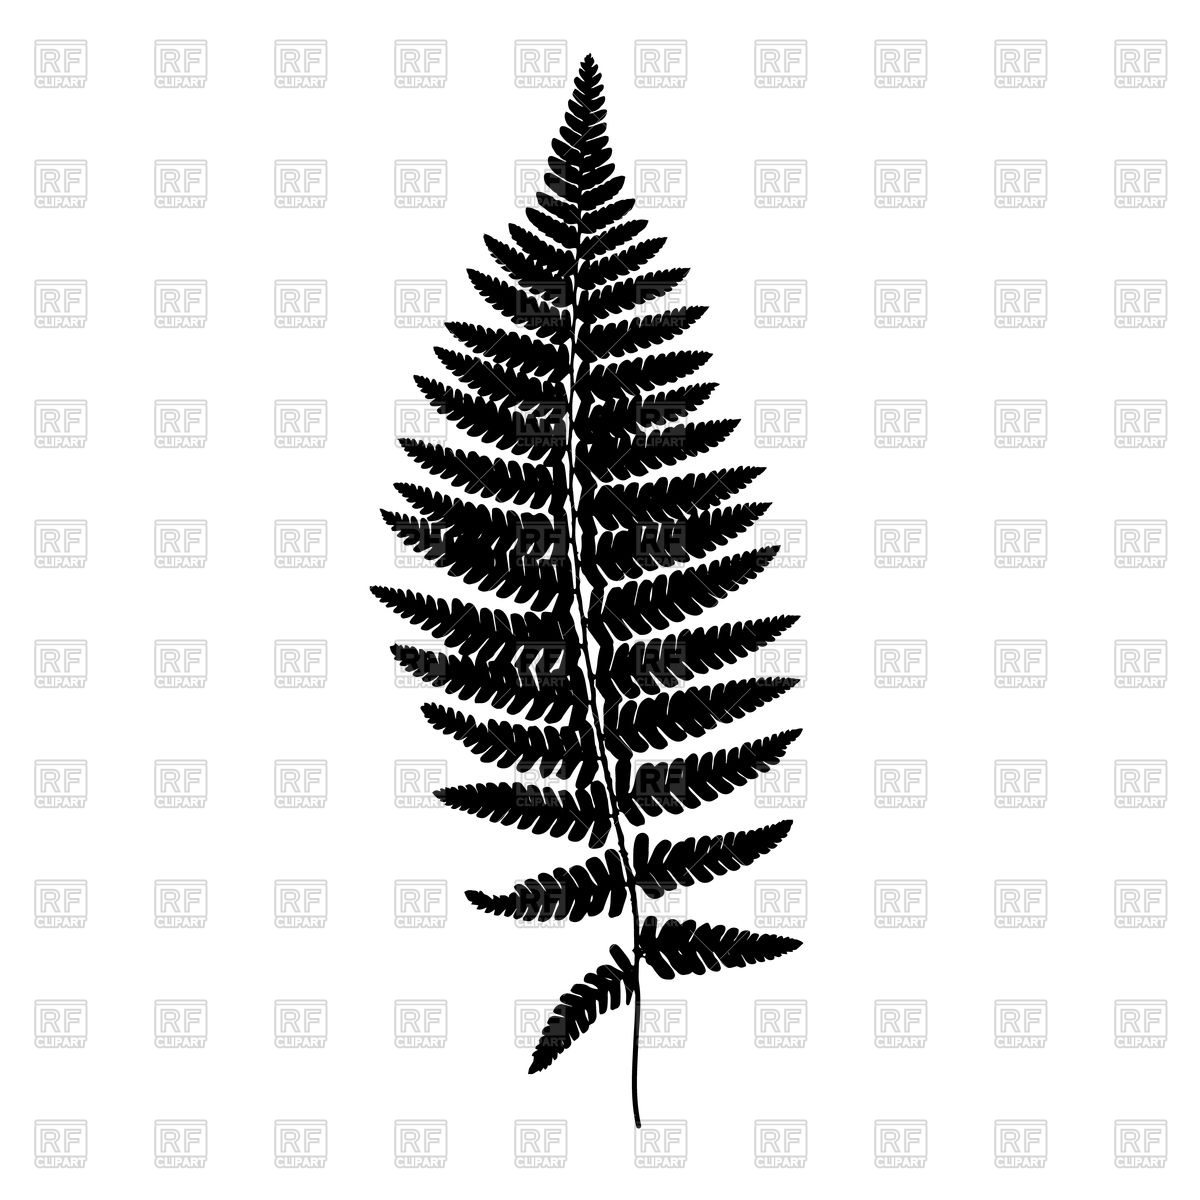 1200x1200 Fern Leaf Black Silhouette Vector Image Vector Artwork Of Plants